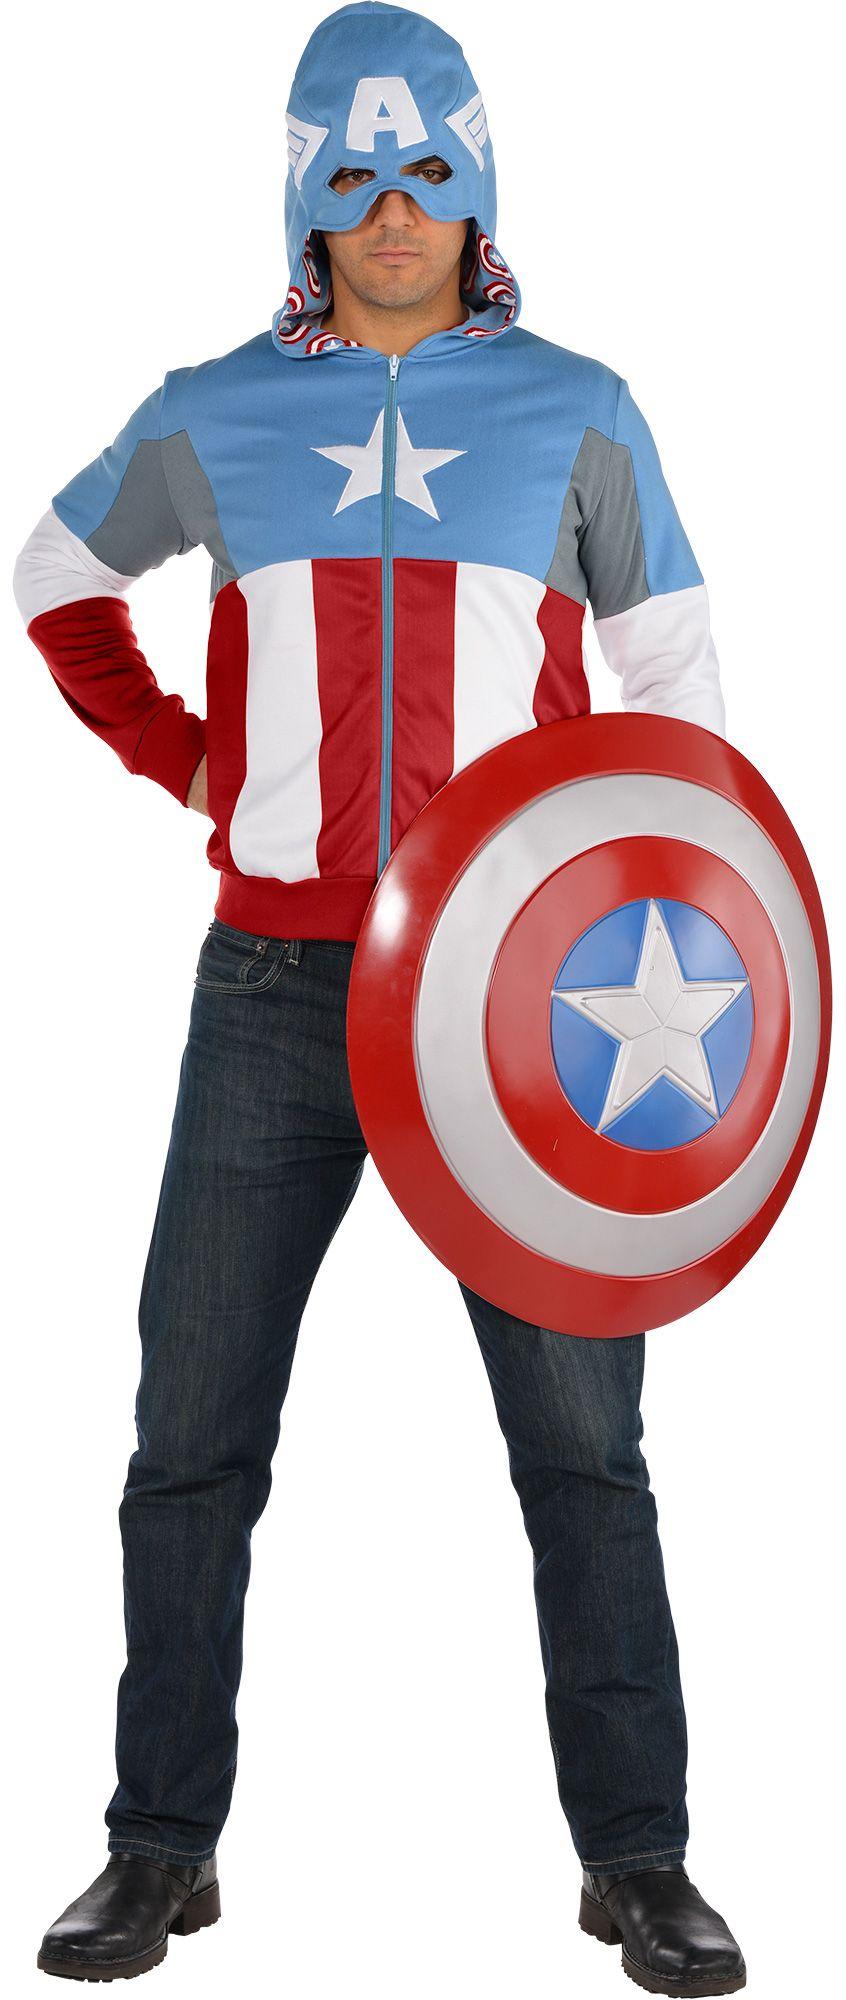 Create Your Own Look - Men's Captain America #2